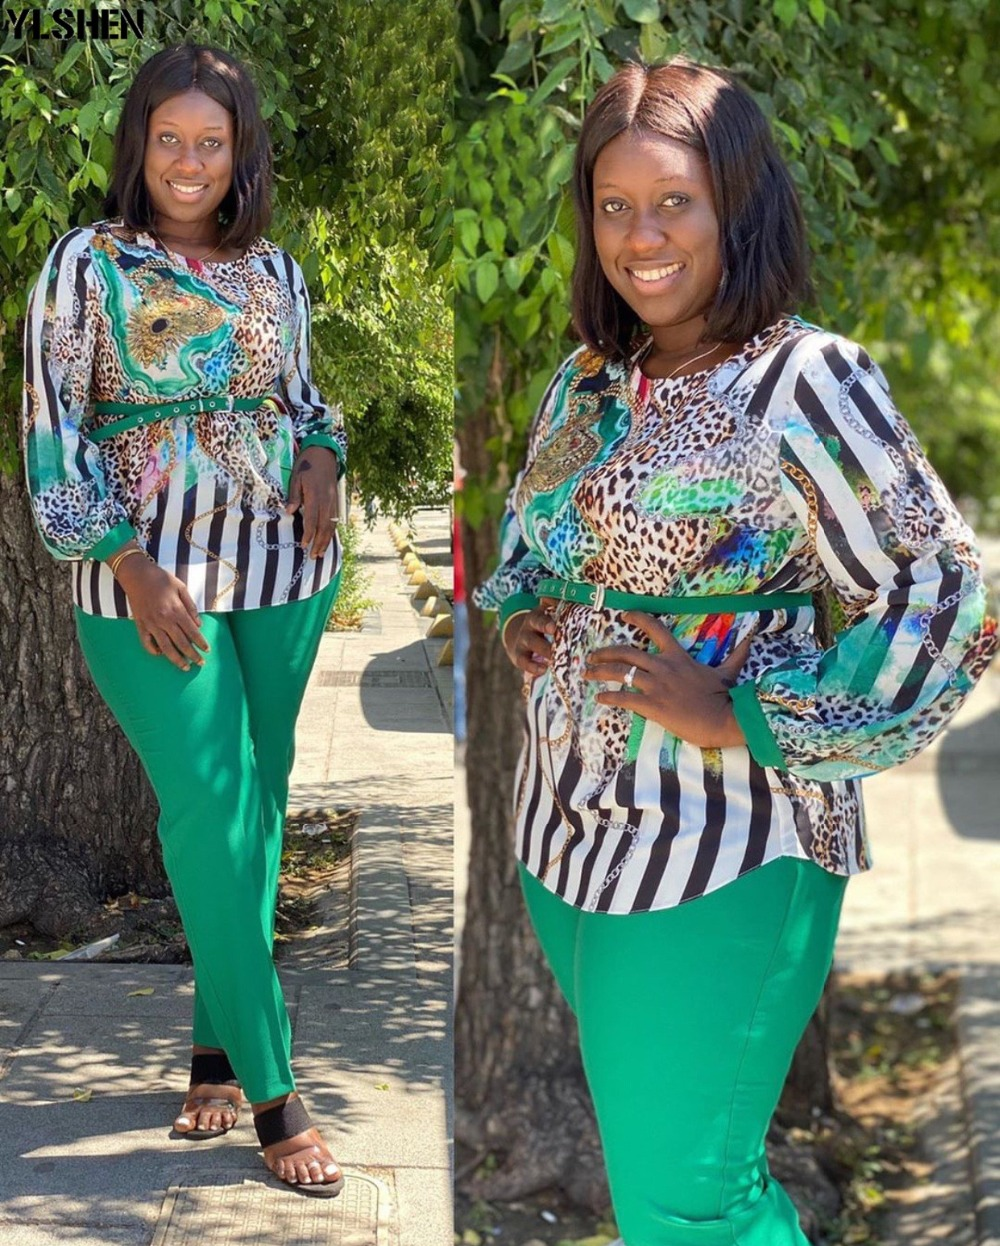 Two 2 Piece Set African Clothes Africa 2020 Dashiki Fashion Print Dresses Suit Bazin Top Pants Elastic Party Plus Size Clothing 09